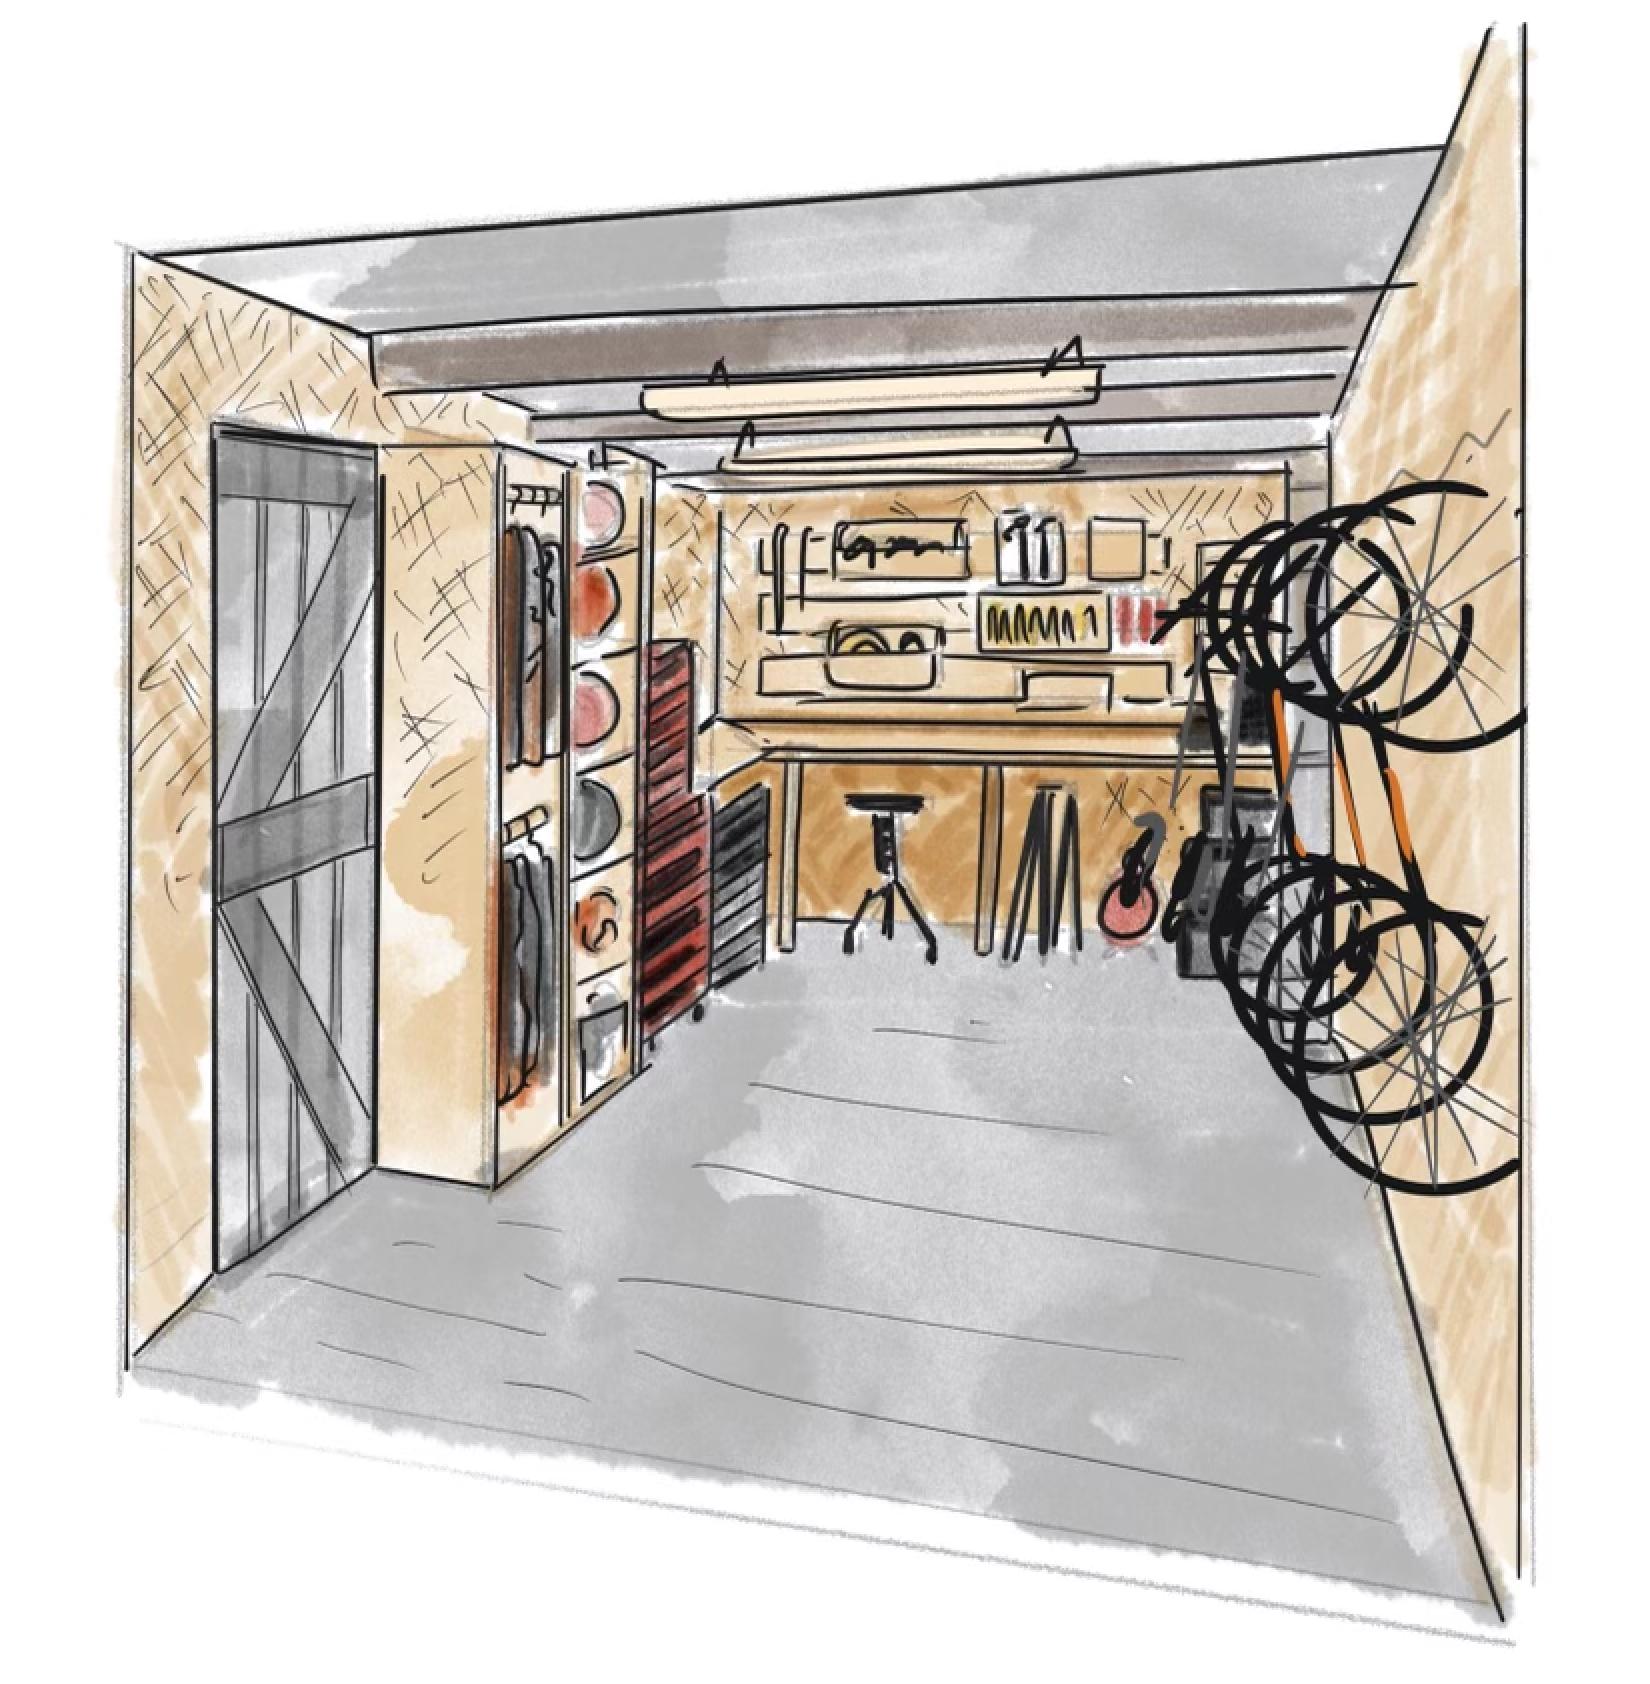 A mockup design of a small garage